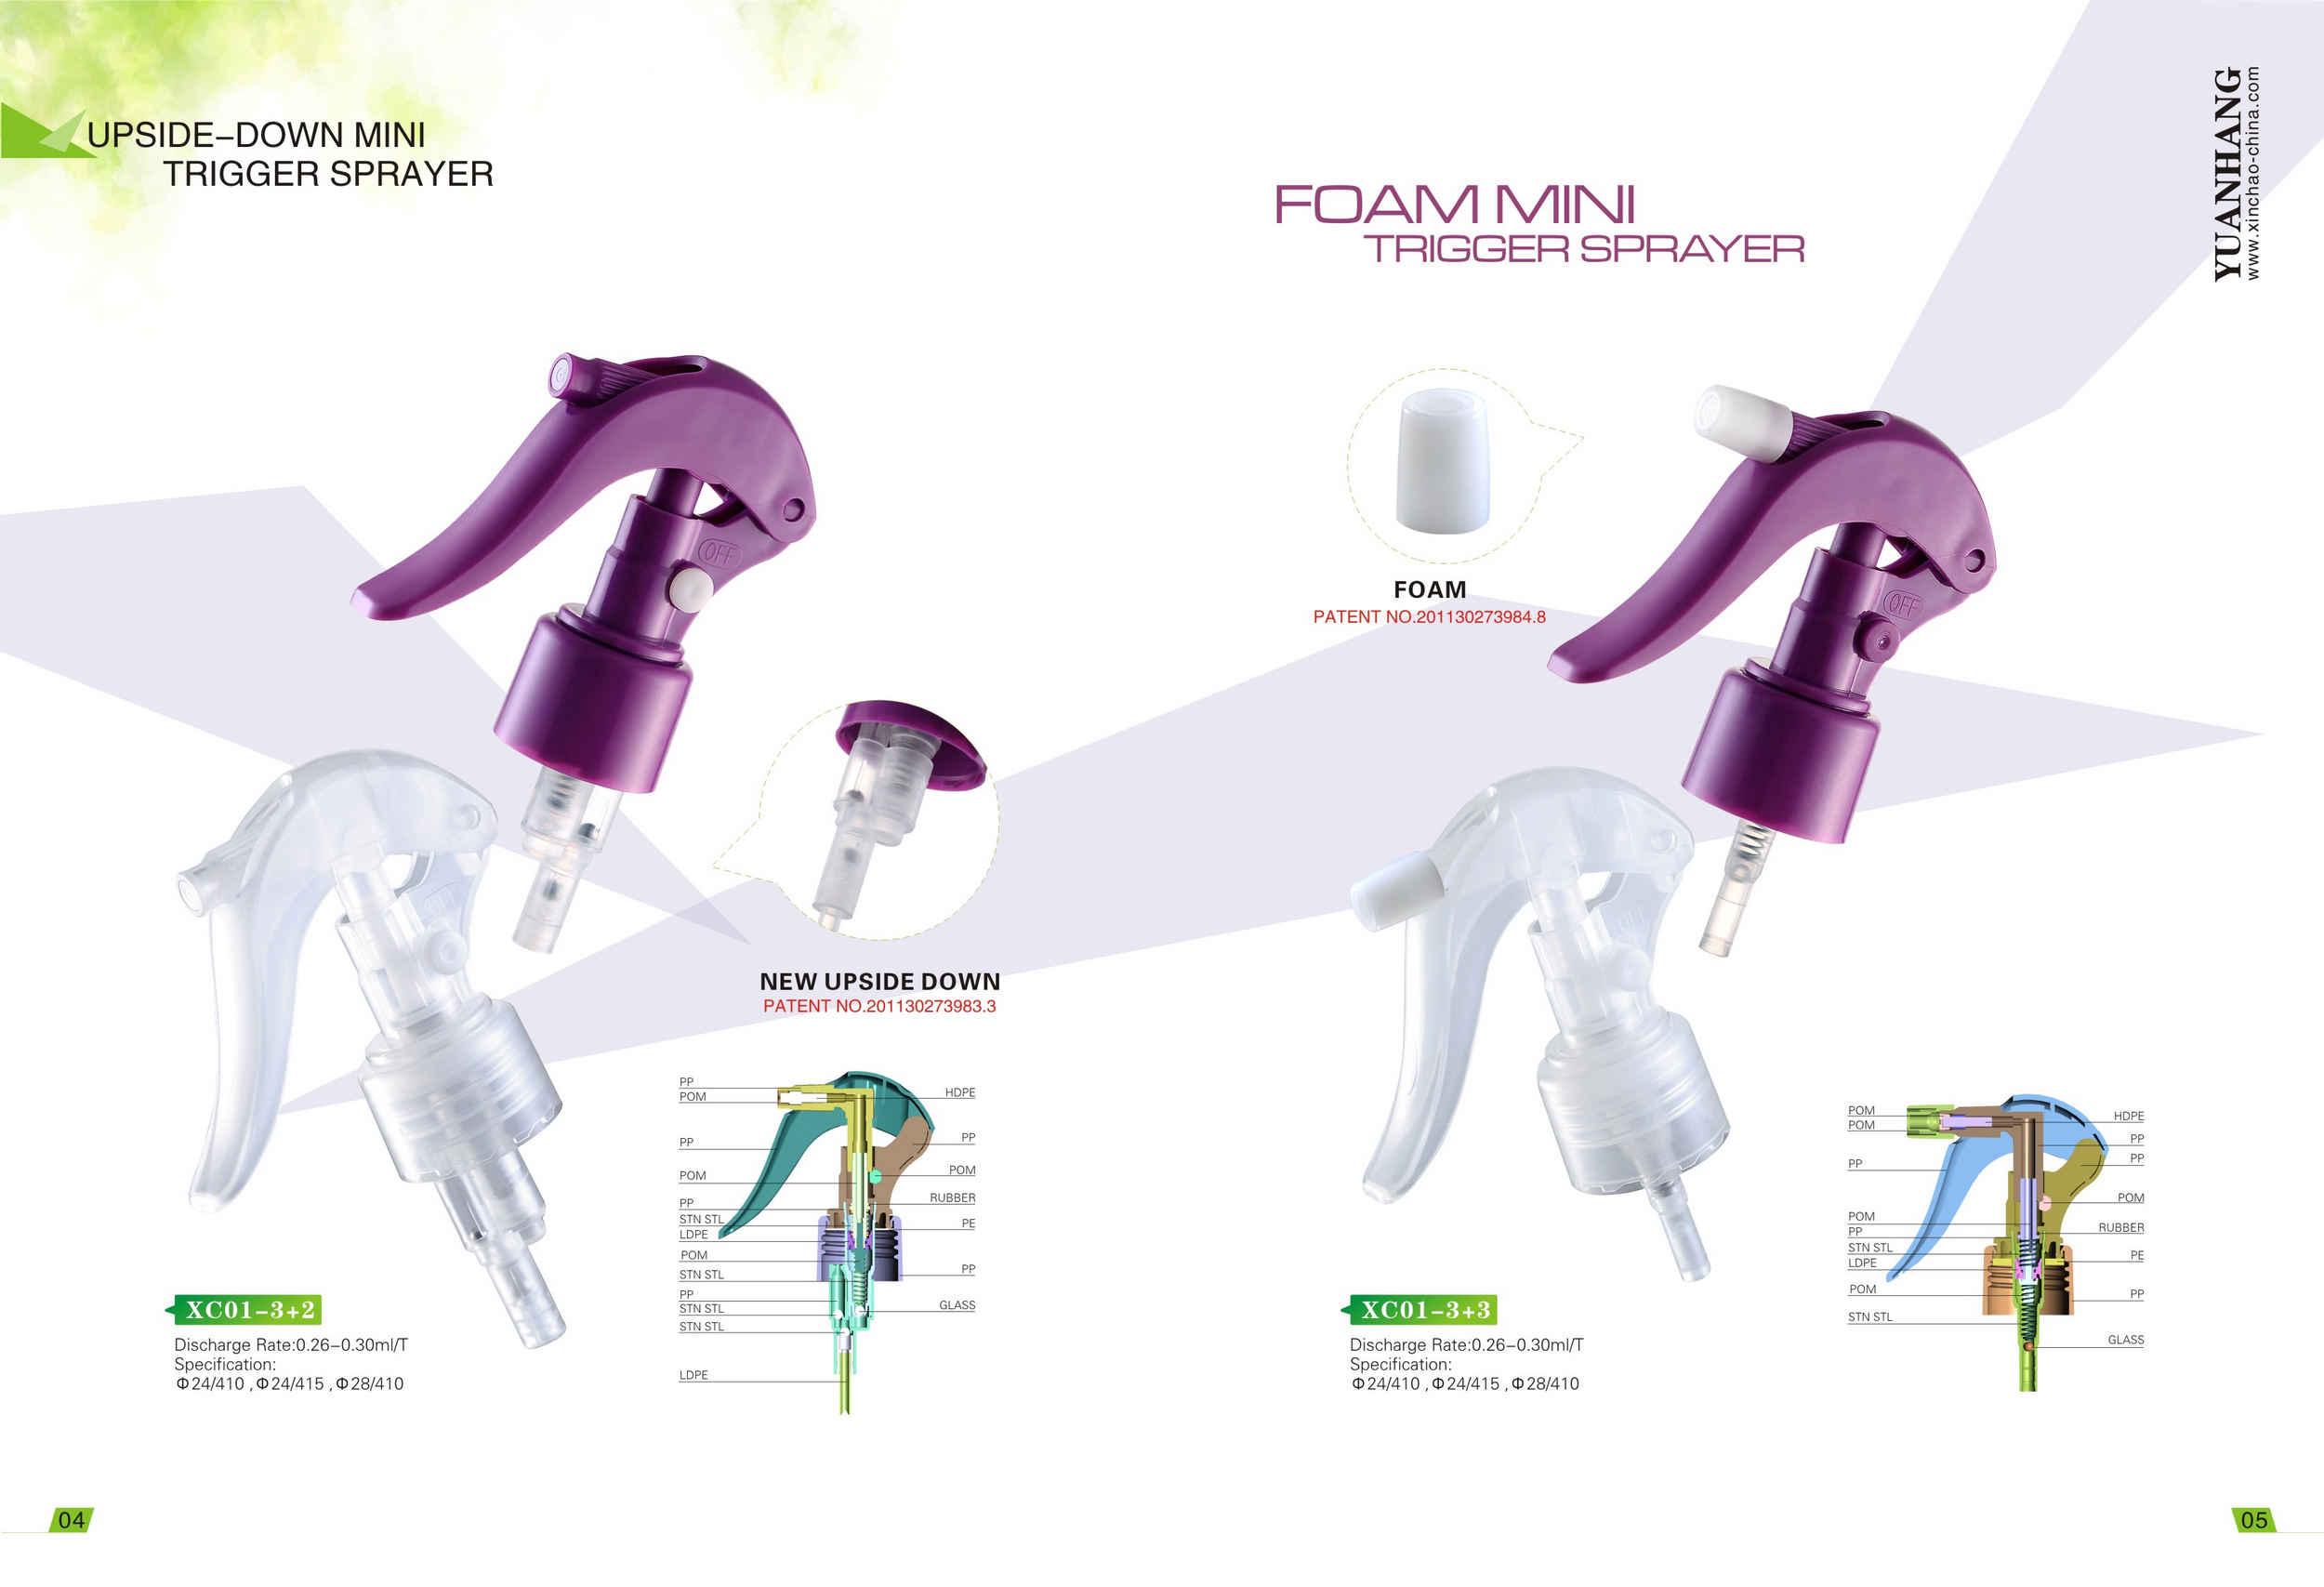 Upside-down and Foam Mini Trigger Sprayer XC01